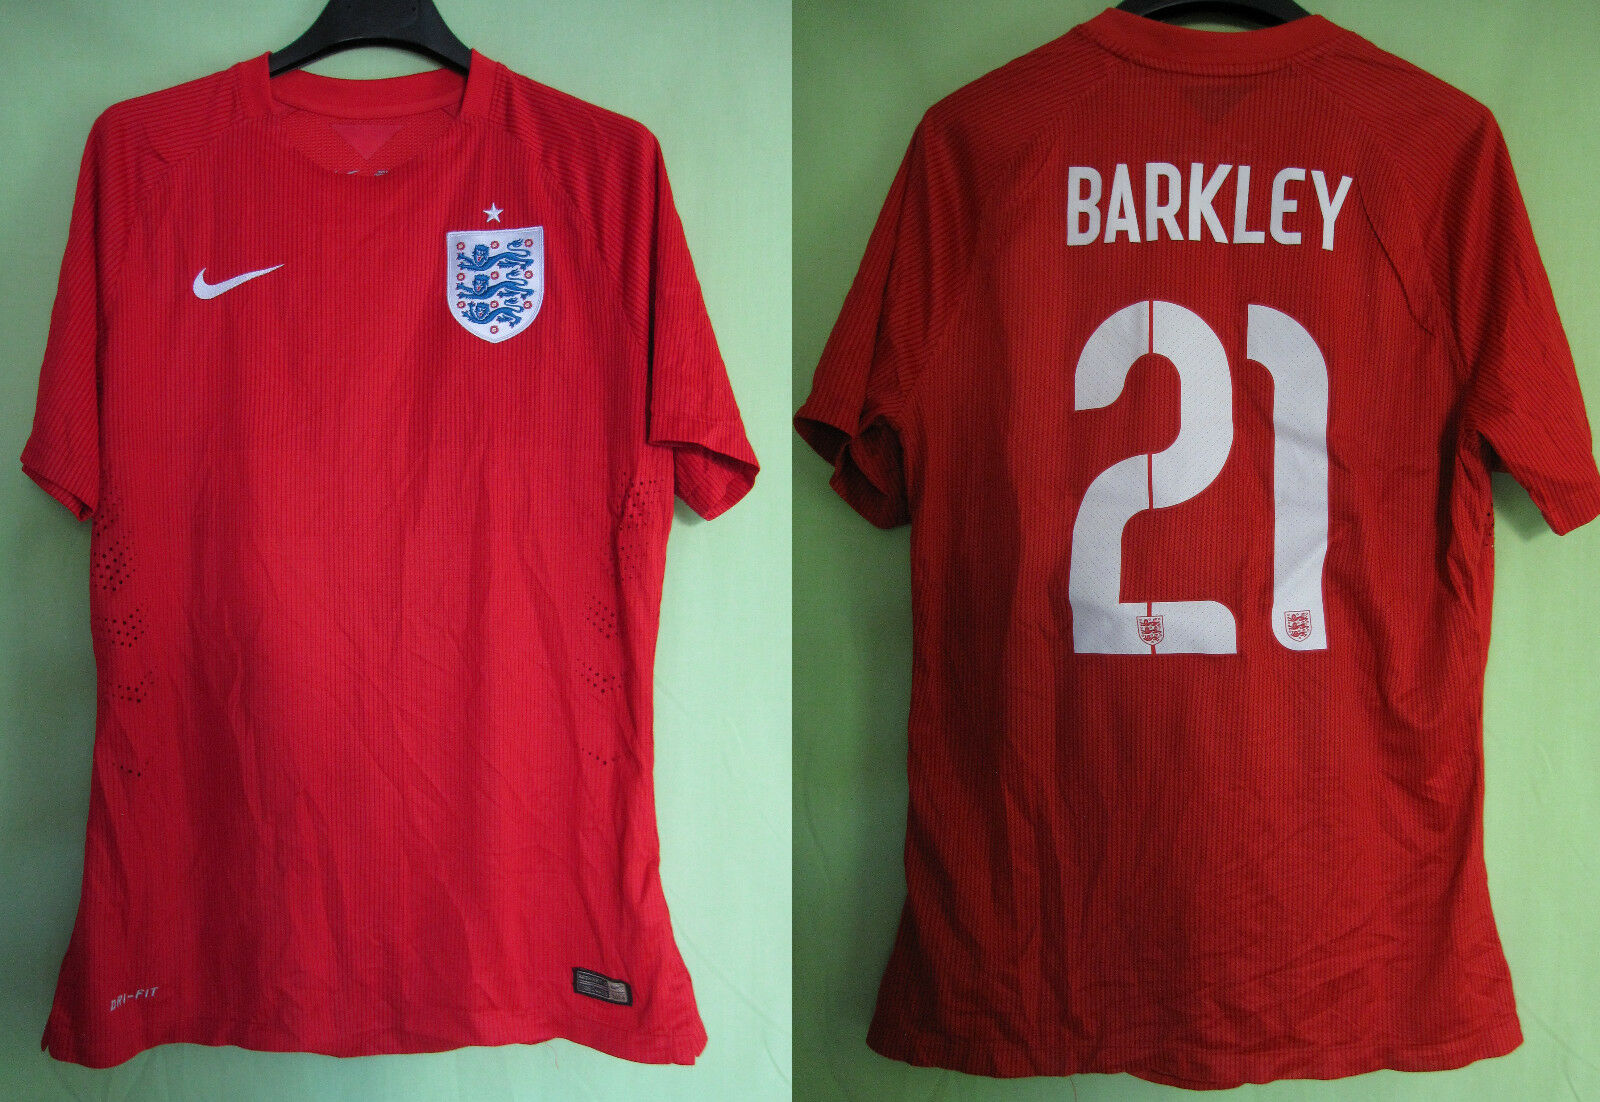 Maillot Agleterre England Away Football Jersey 2014 Barkley Vintage - L